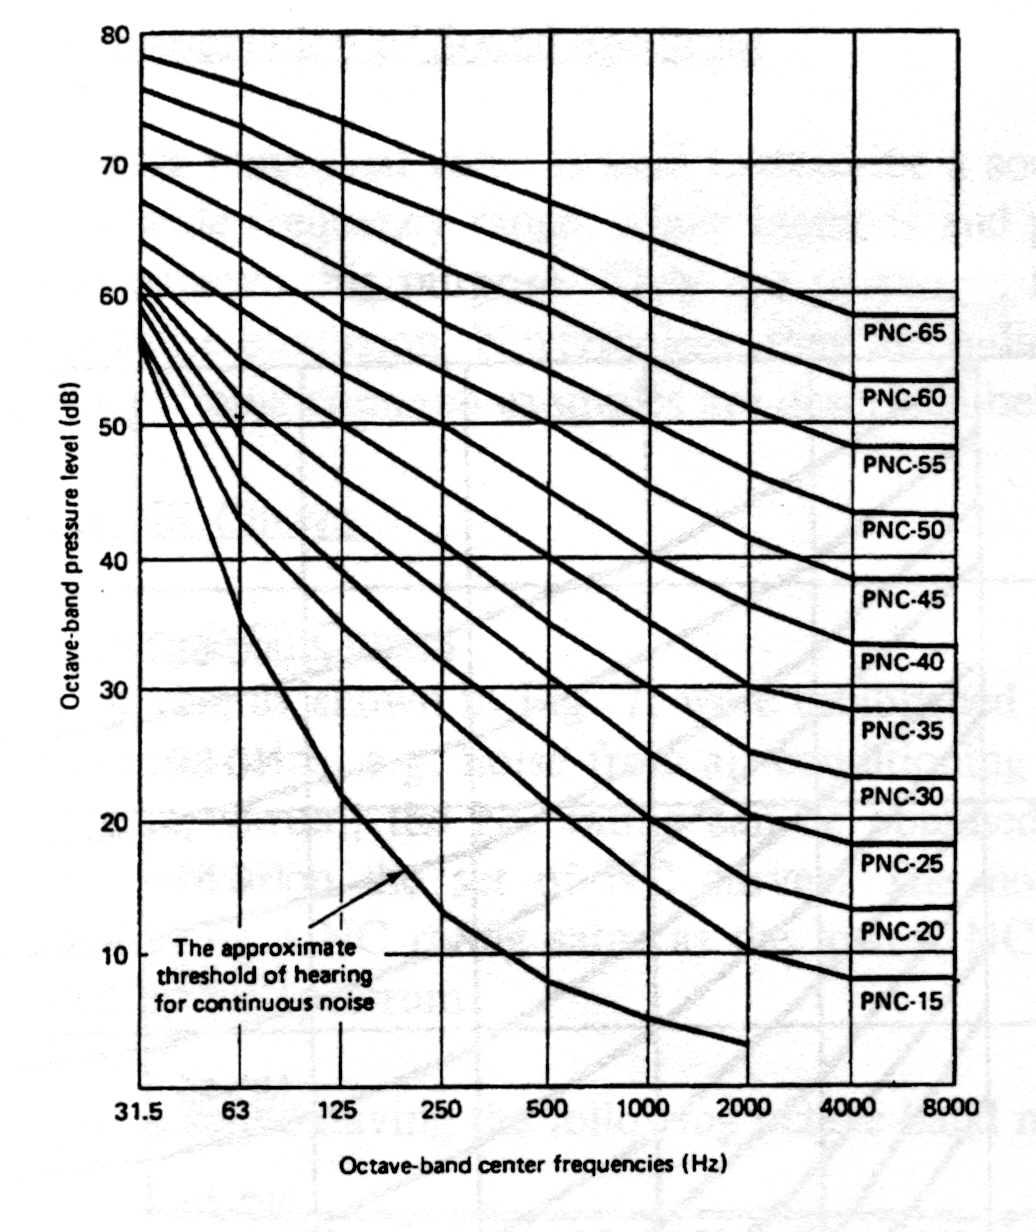 single value representation of sound spectrum